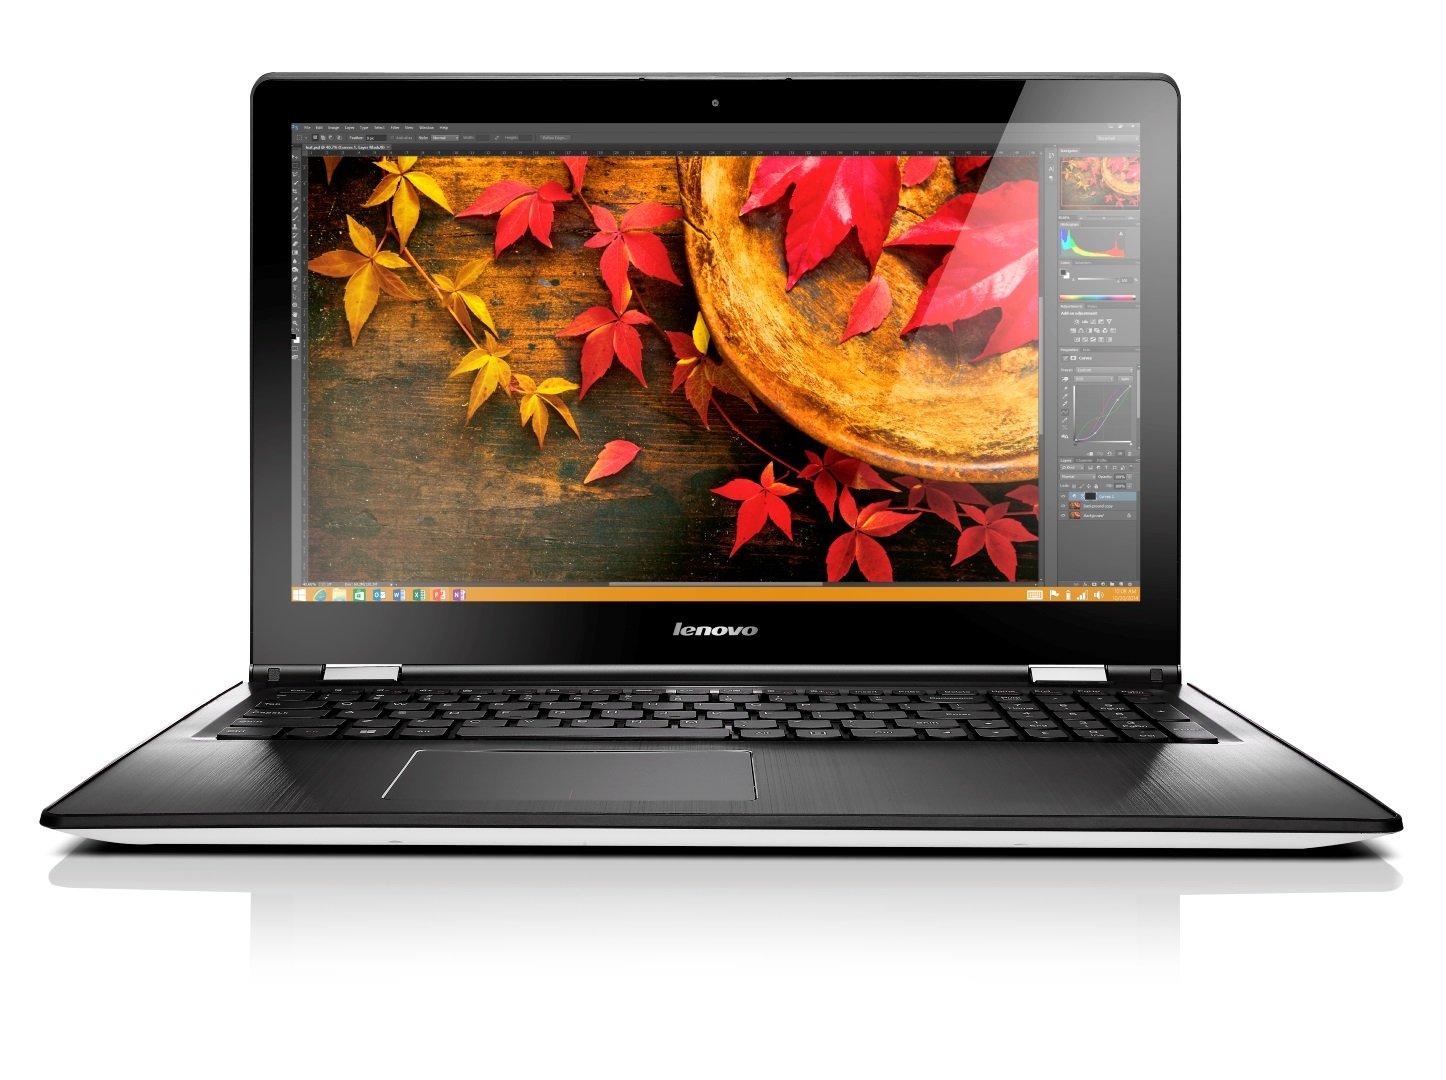 Lenovo Yoga 500 15 - Portátil de 15.6